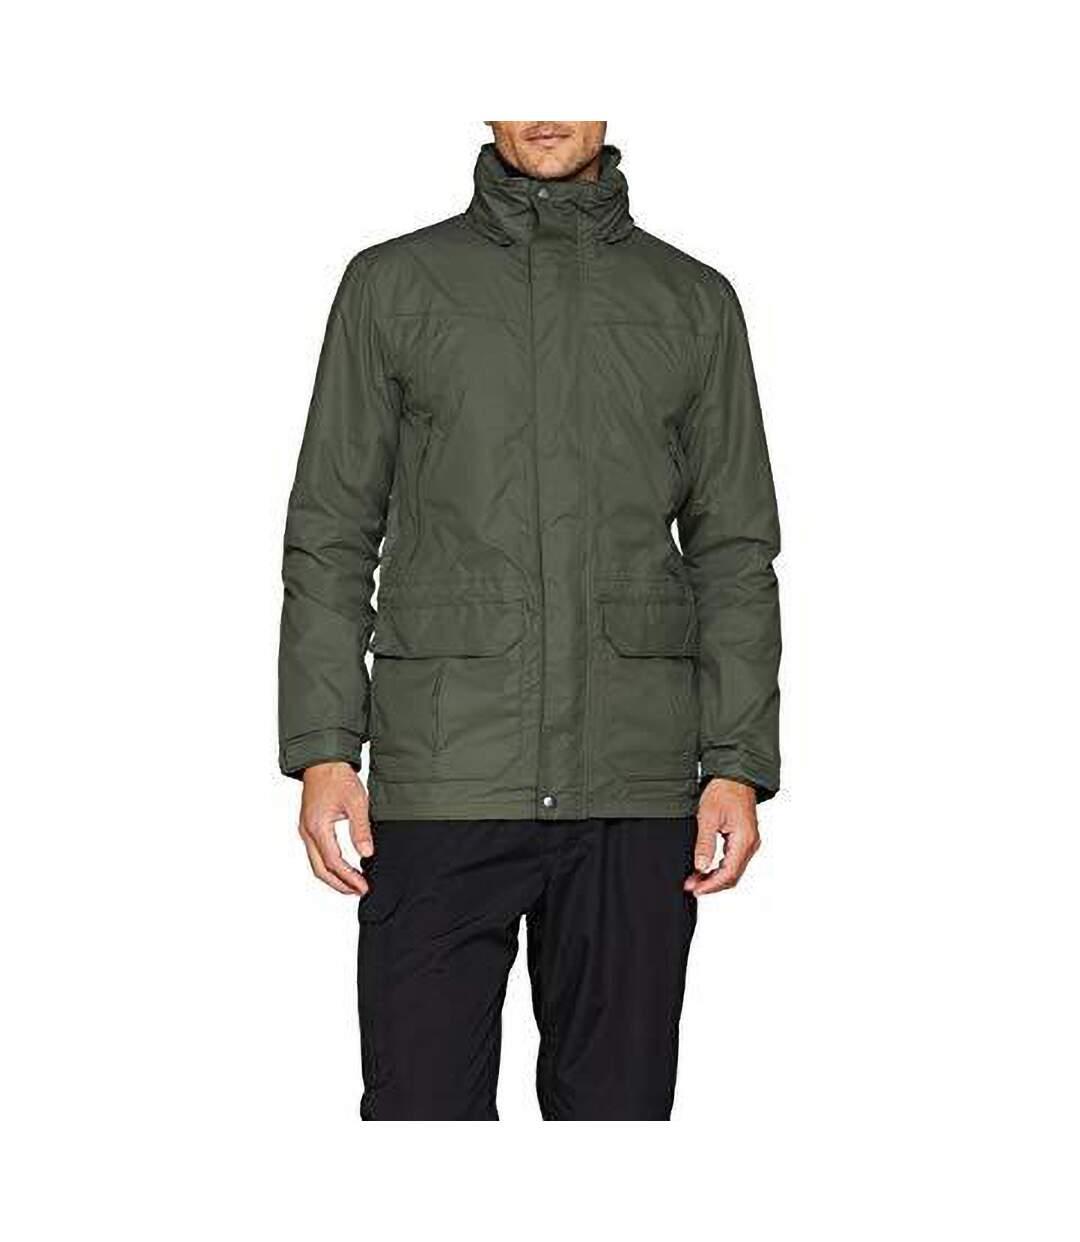 Regatta Mens Vertex III Waterproof Breathable Jacket (Dark Olive) - UTBC3030